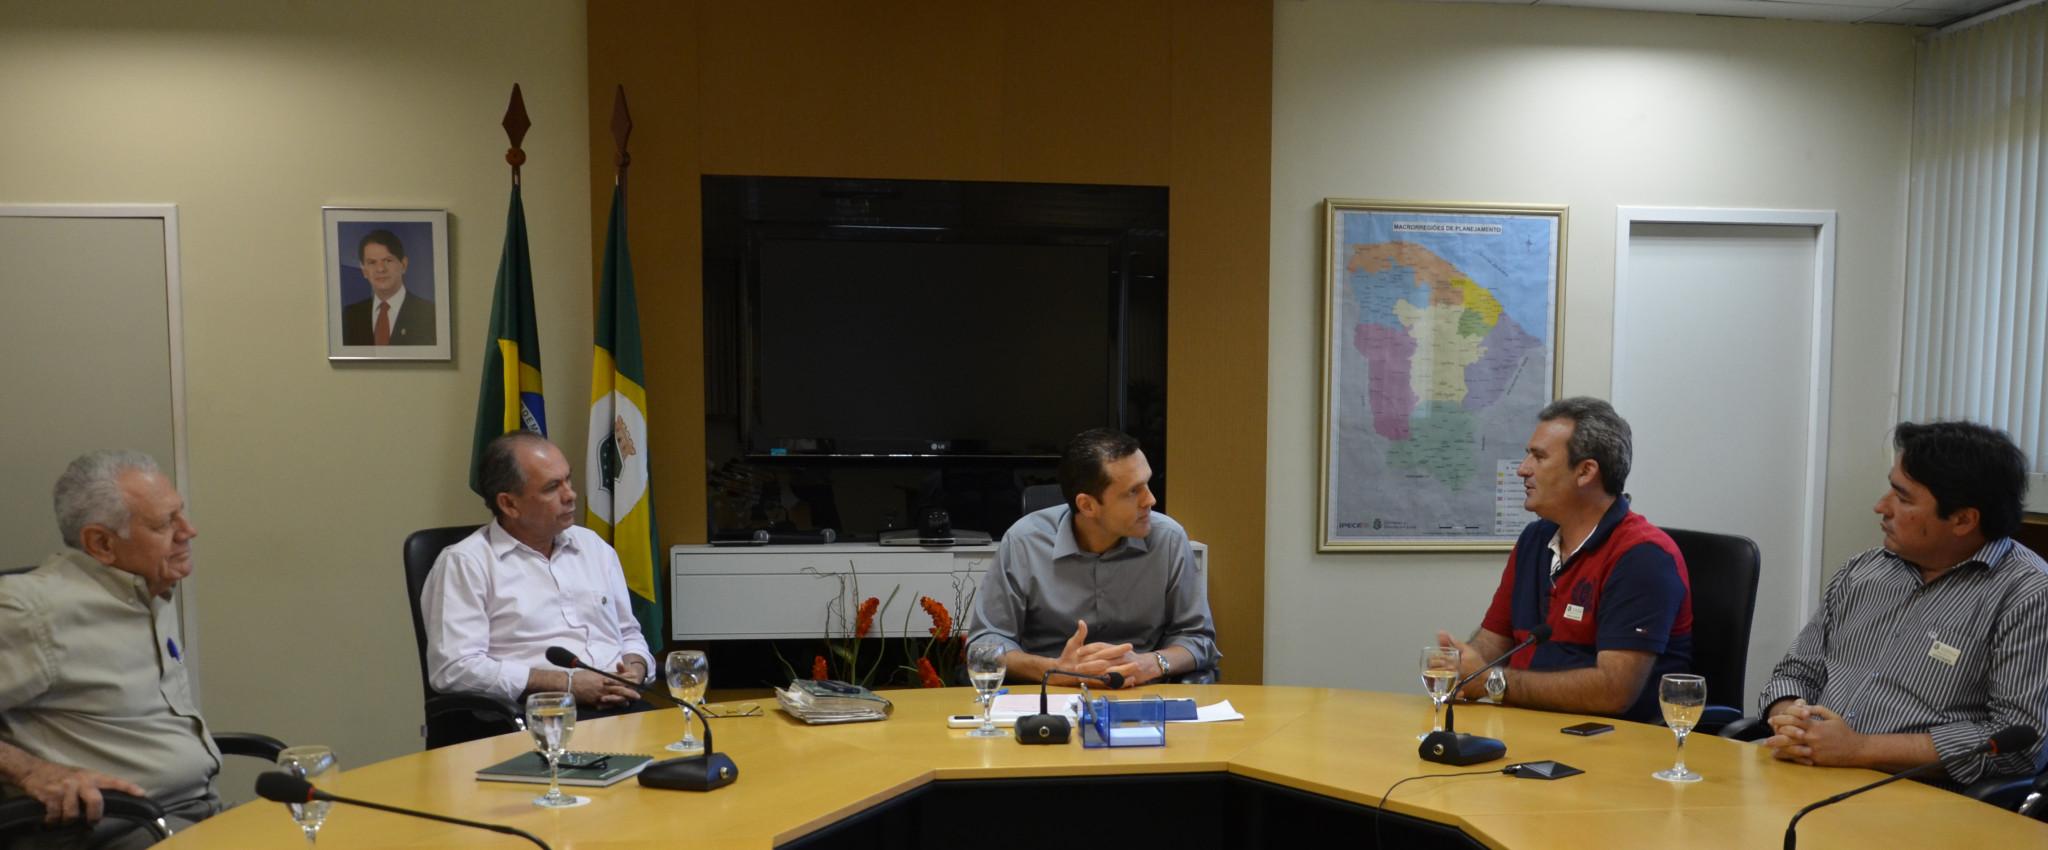 Governo atende entidades e estuda PPP para novo Parque de Exposições